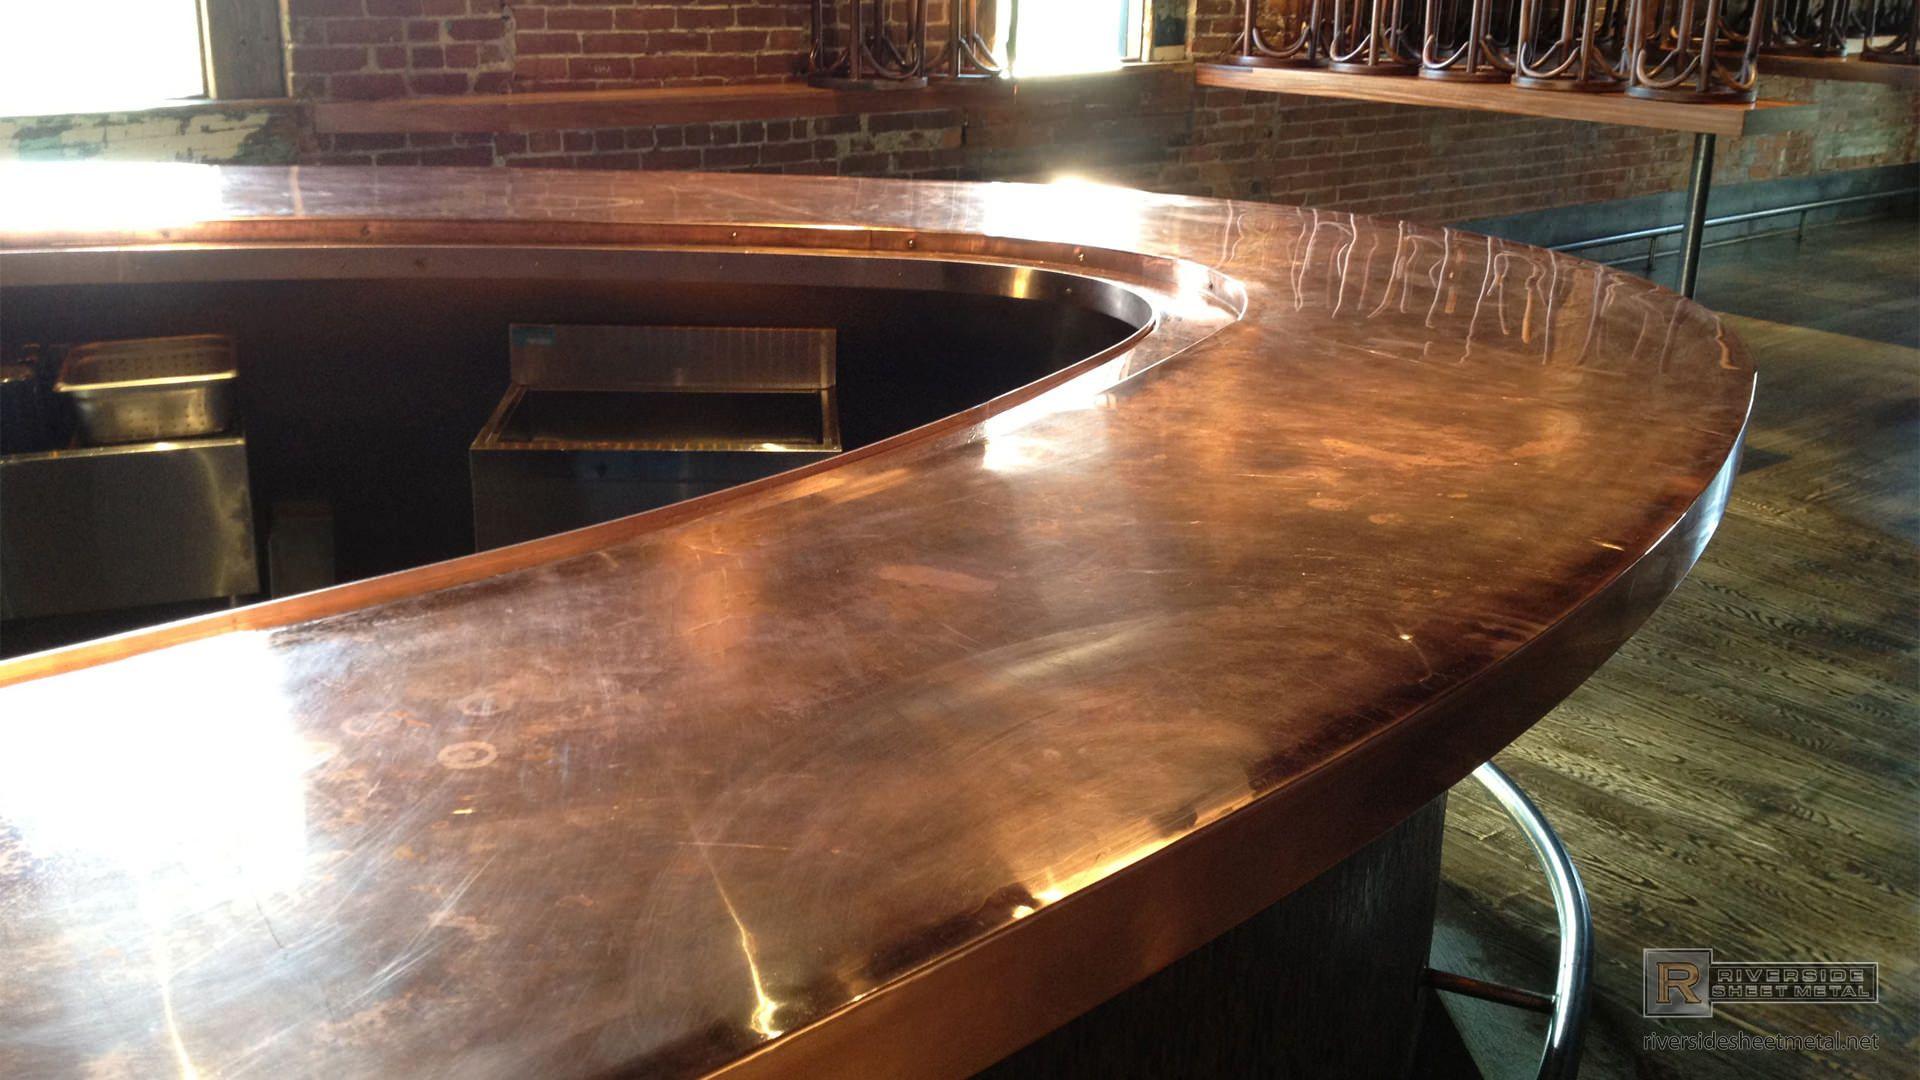 Radius Copper Bar Top Copper Counter Tops Outdoor Kitchen Countertops Copper Bar Top Copper Countertops